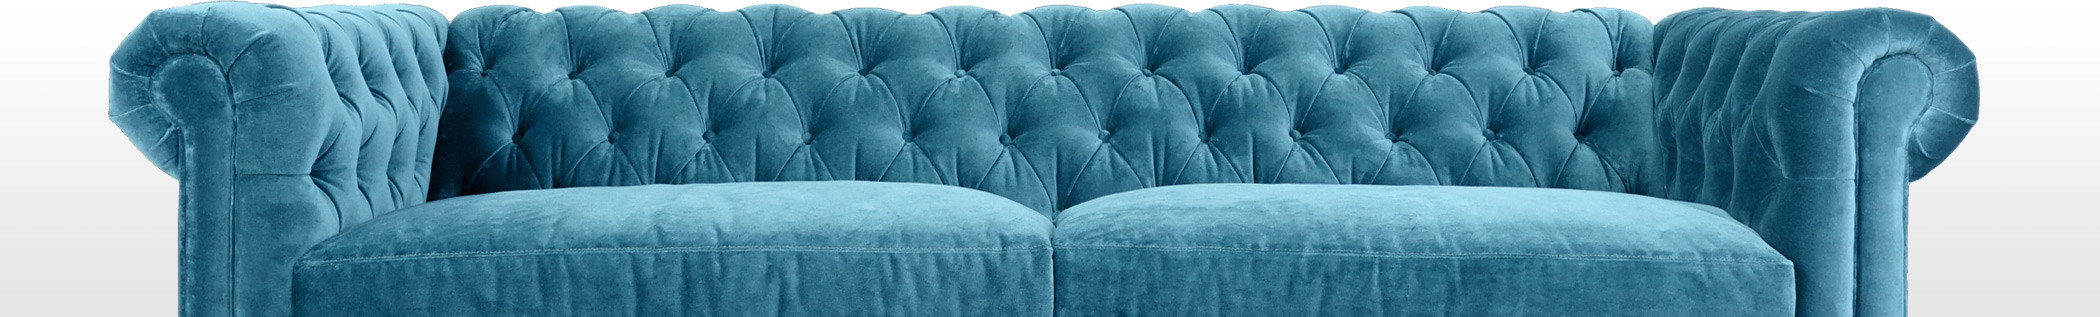 chesterfields sofa armchairs